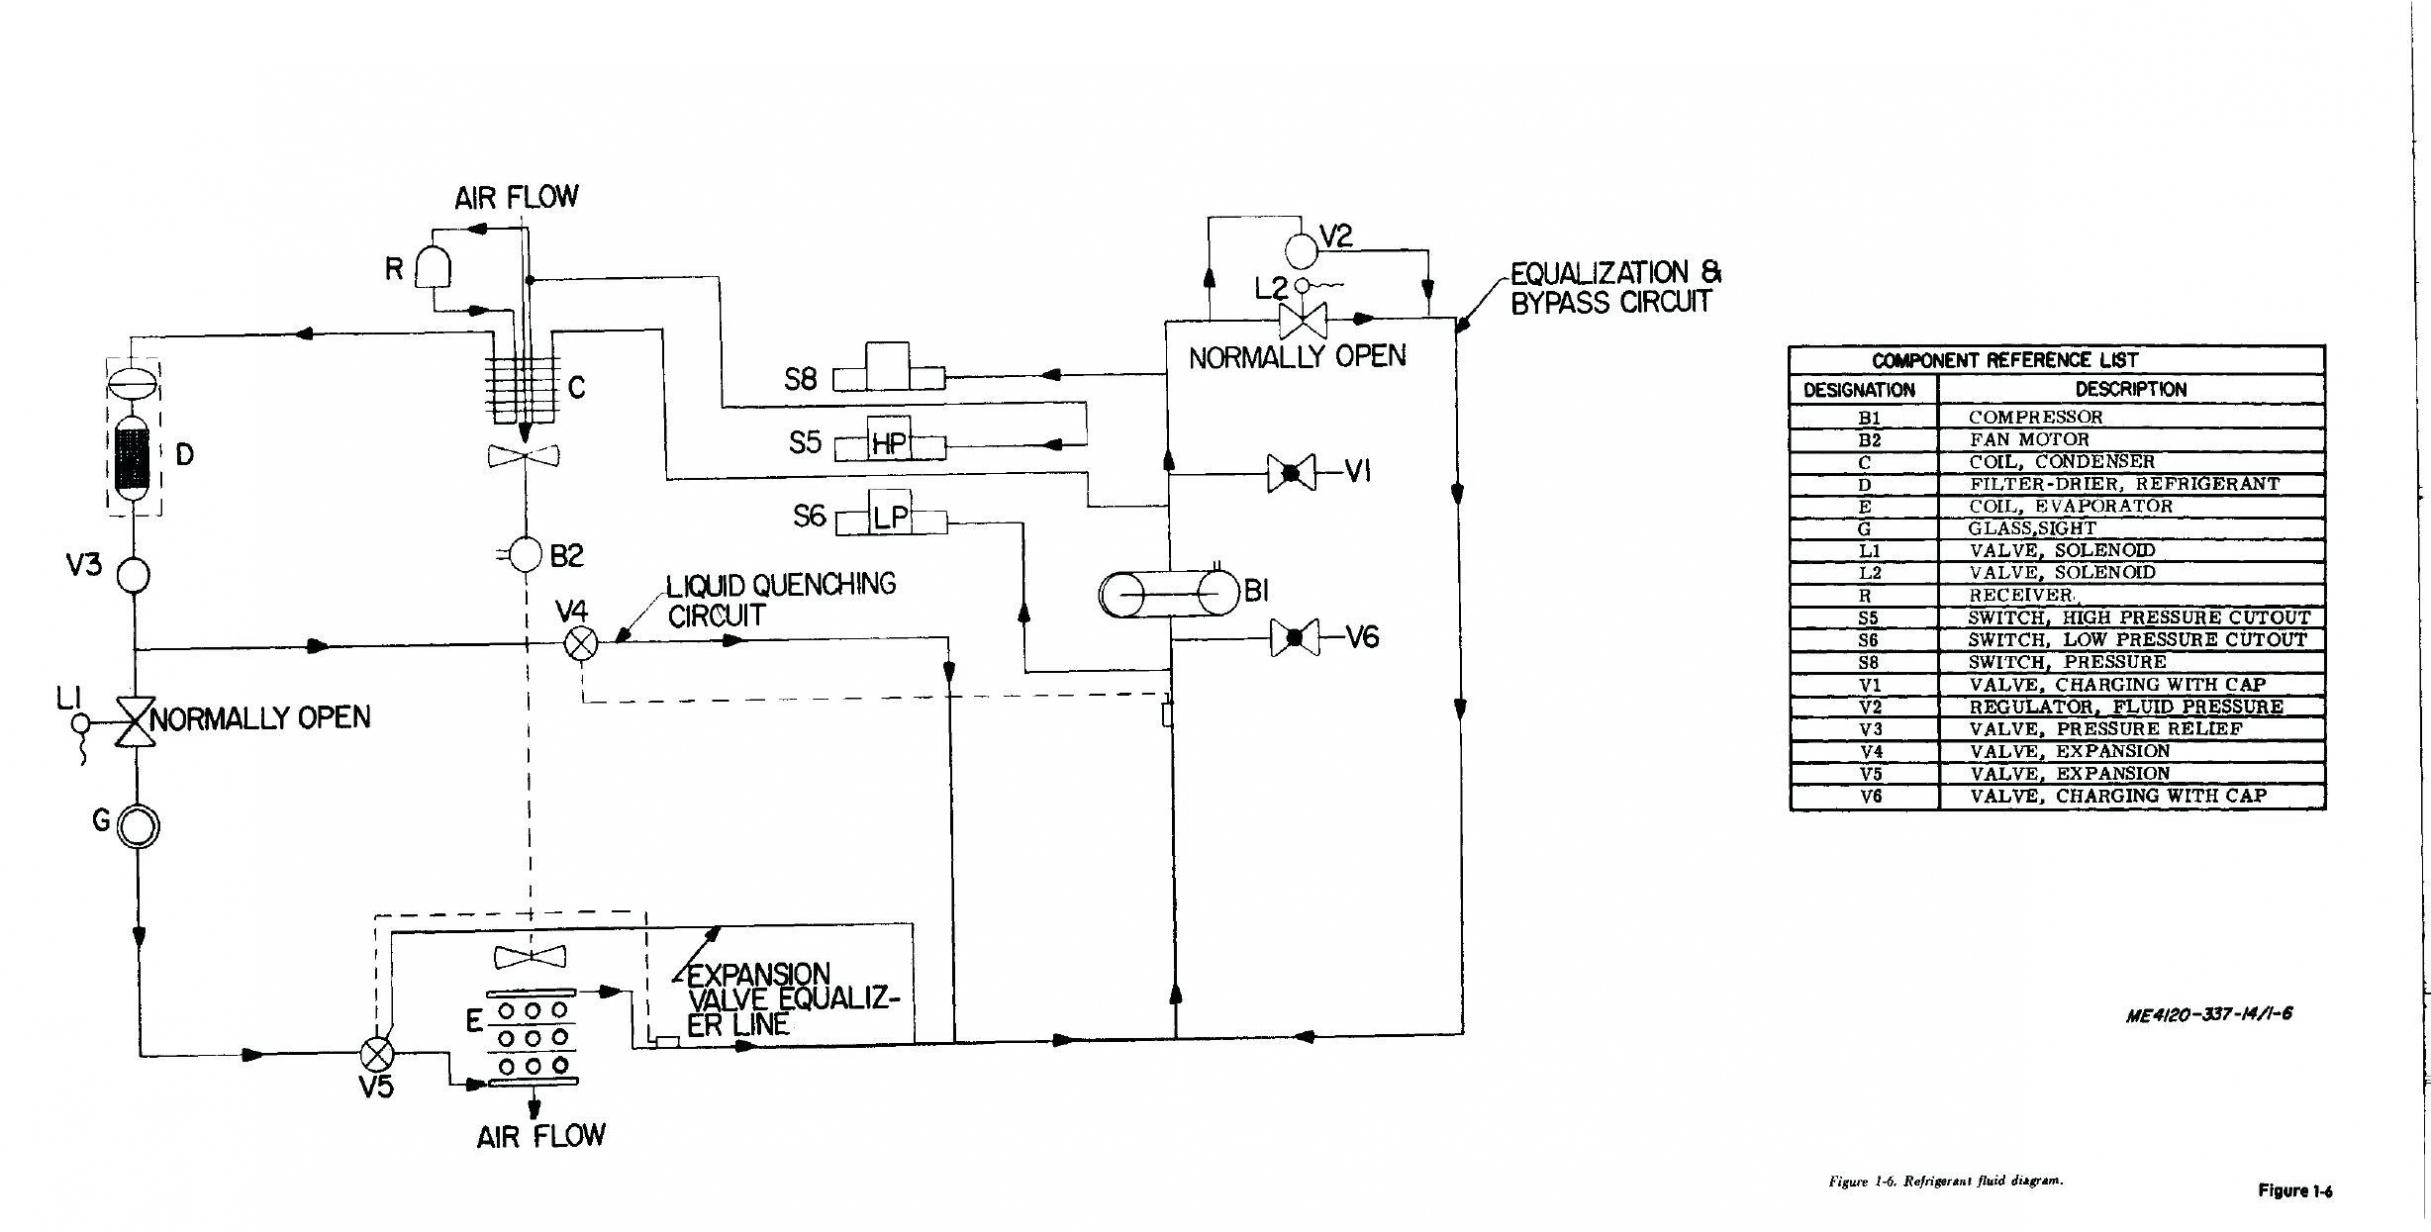 Carrier Ac Unit Wiring Diagram Sample – Aircon Compressor Wiring - Aircon Compressor Wiring Diagram